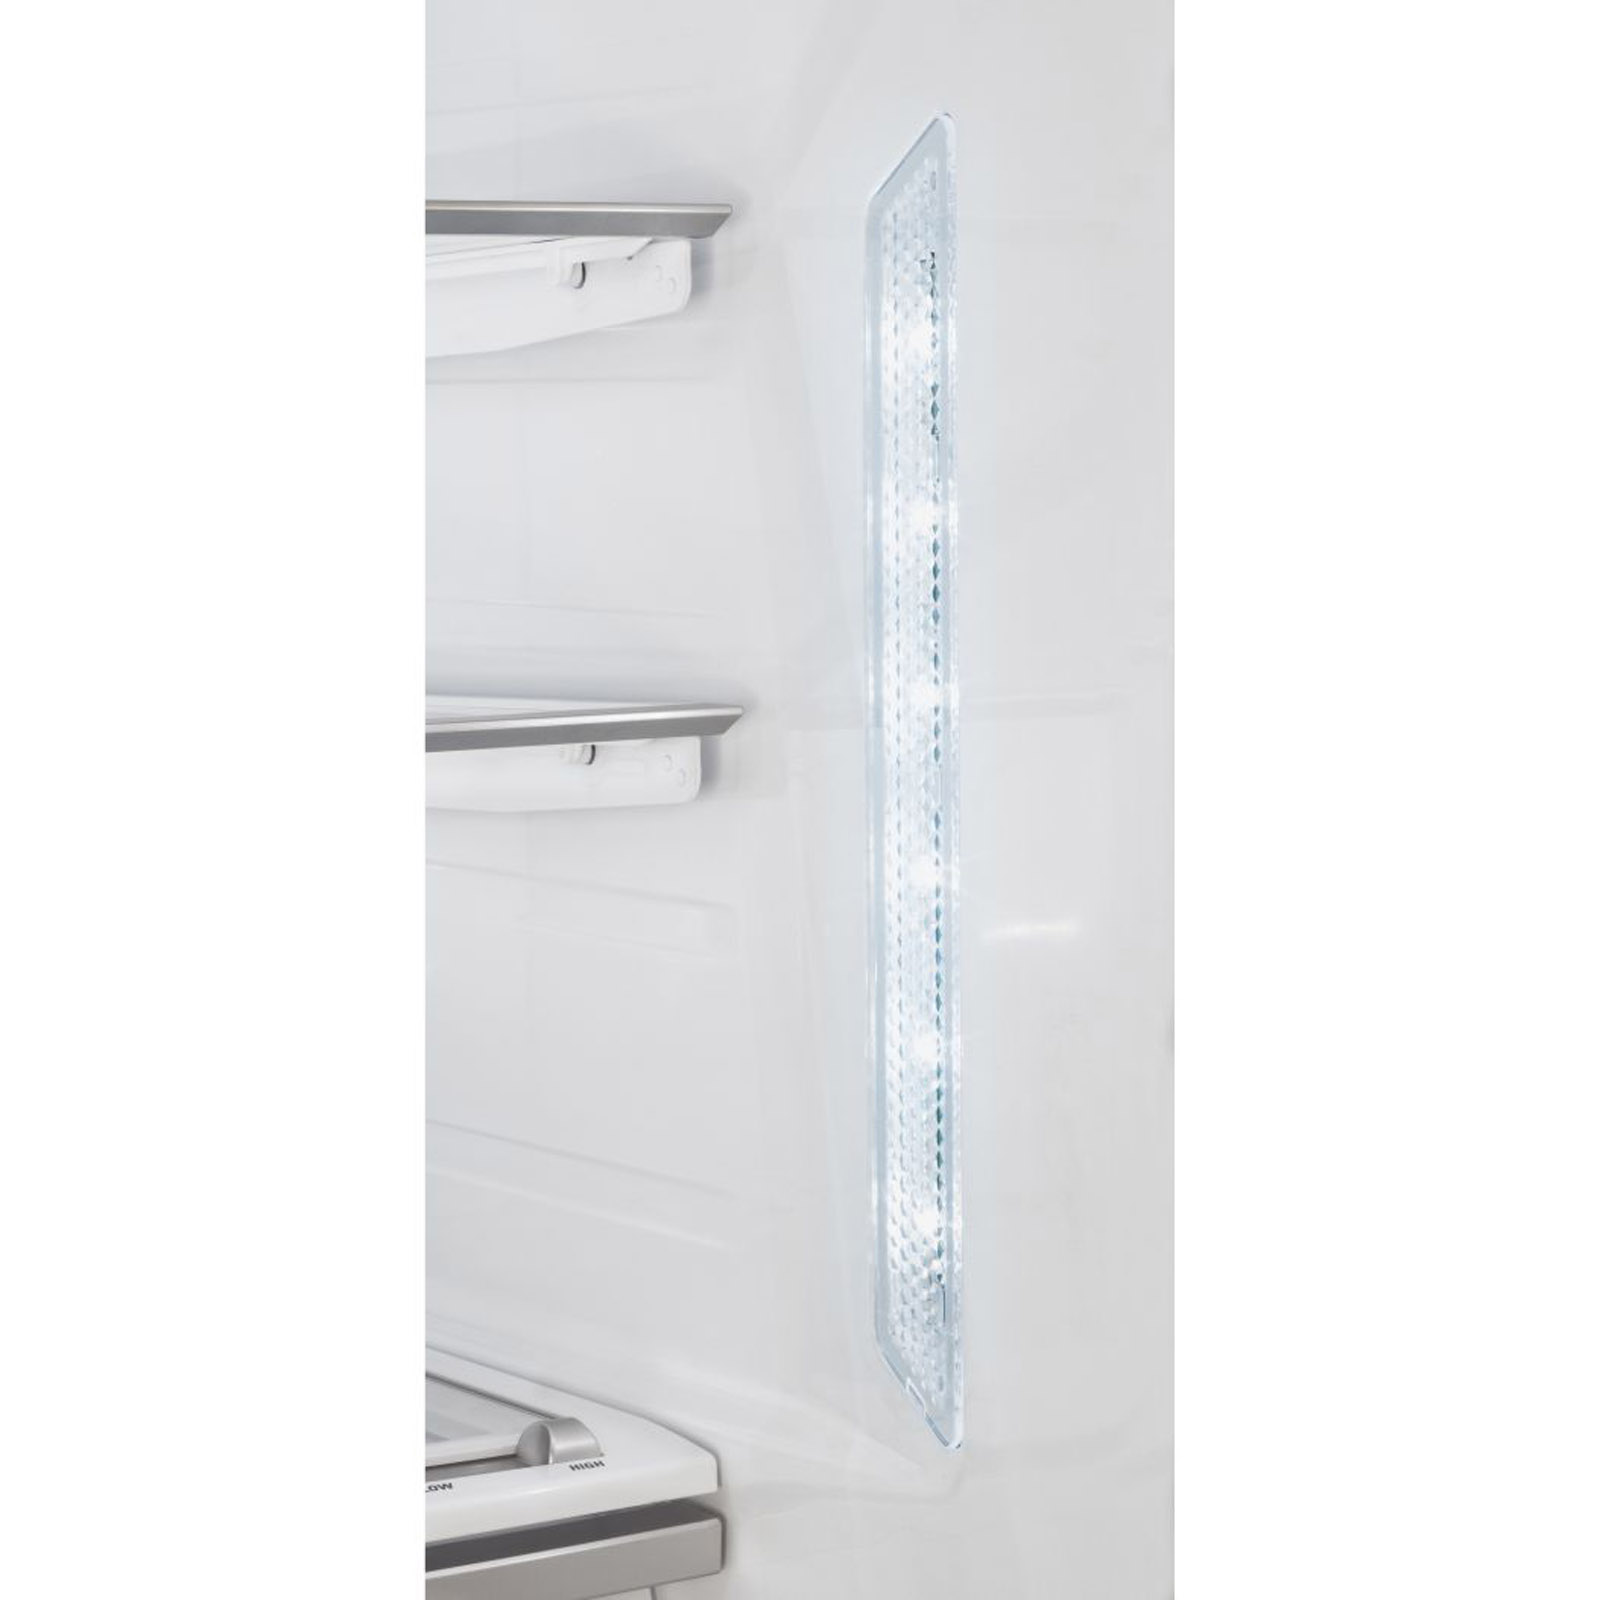 Kenmore Elite 31.0 cu. ft. French Door Bottom-Freezer Refrigerator - White